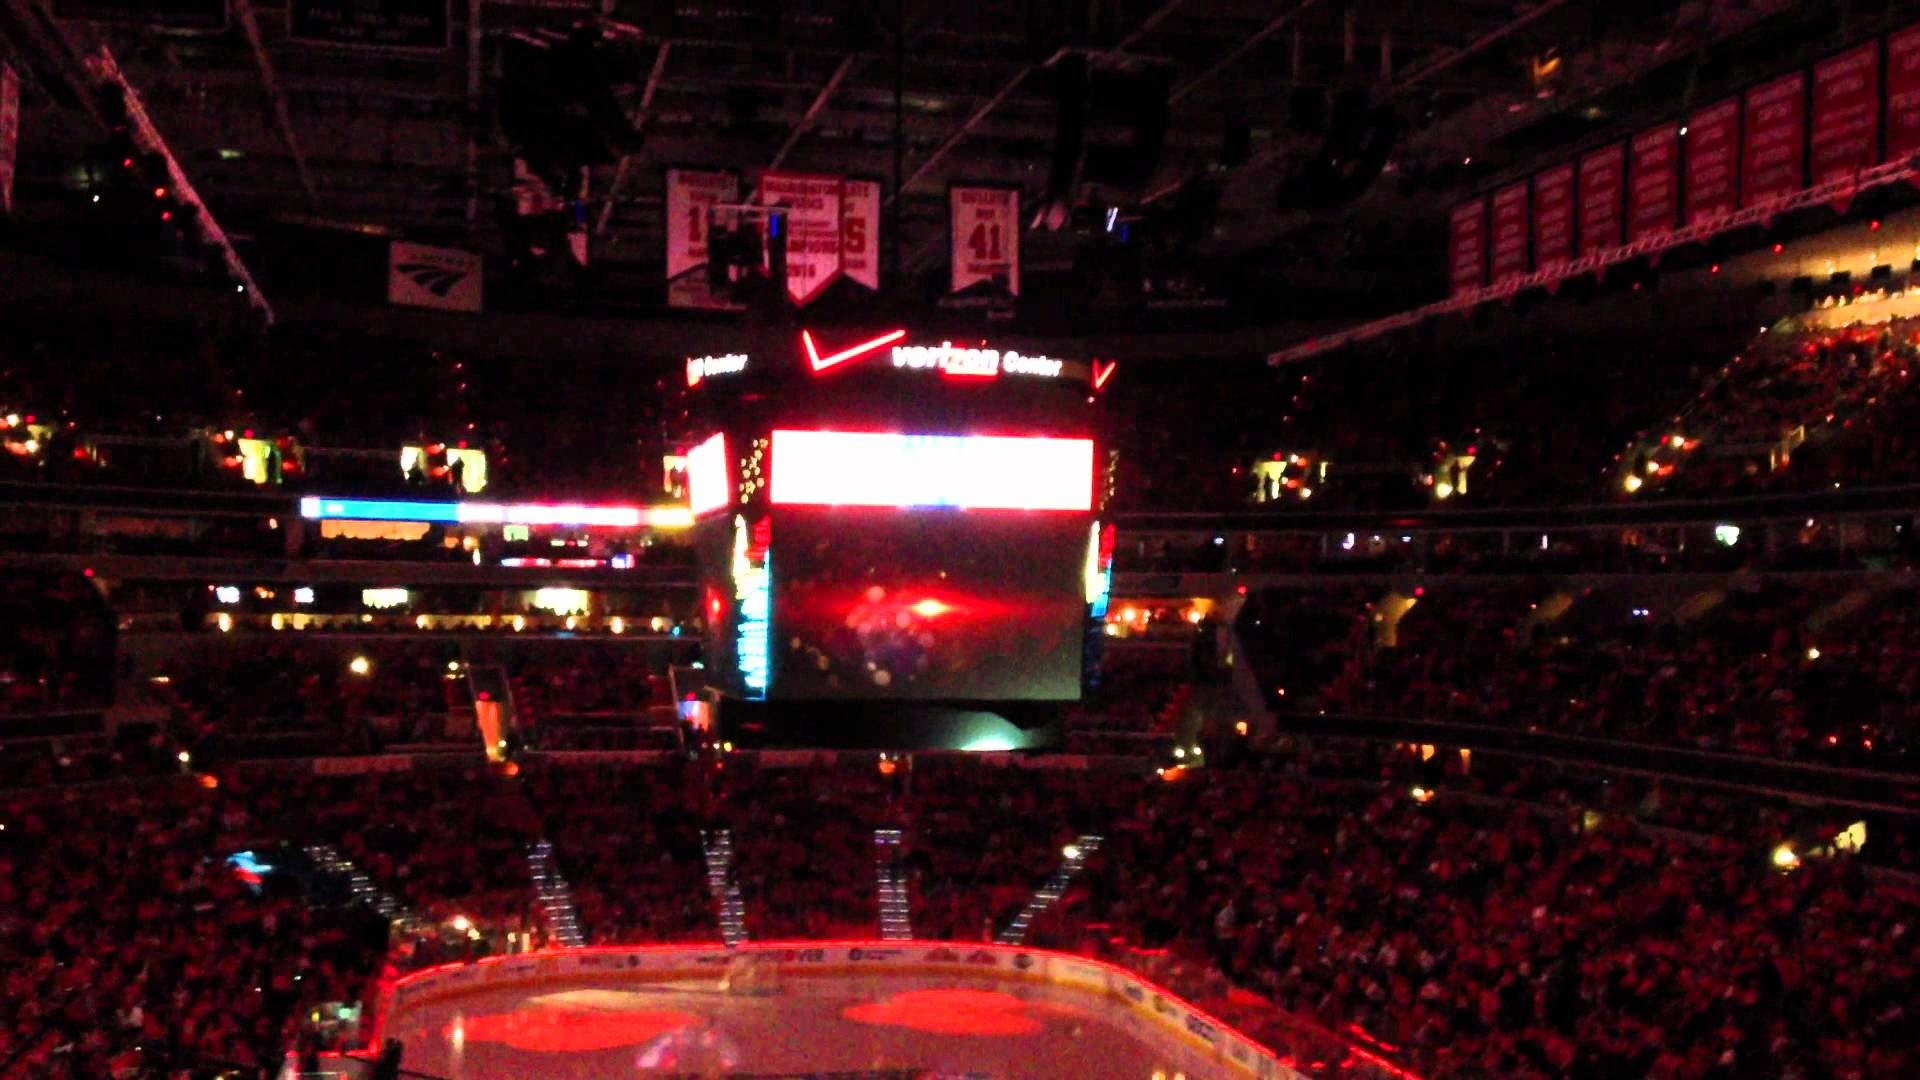 Washington Capitals inGame Playoff Intro Video 2012